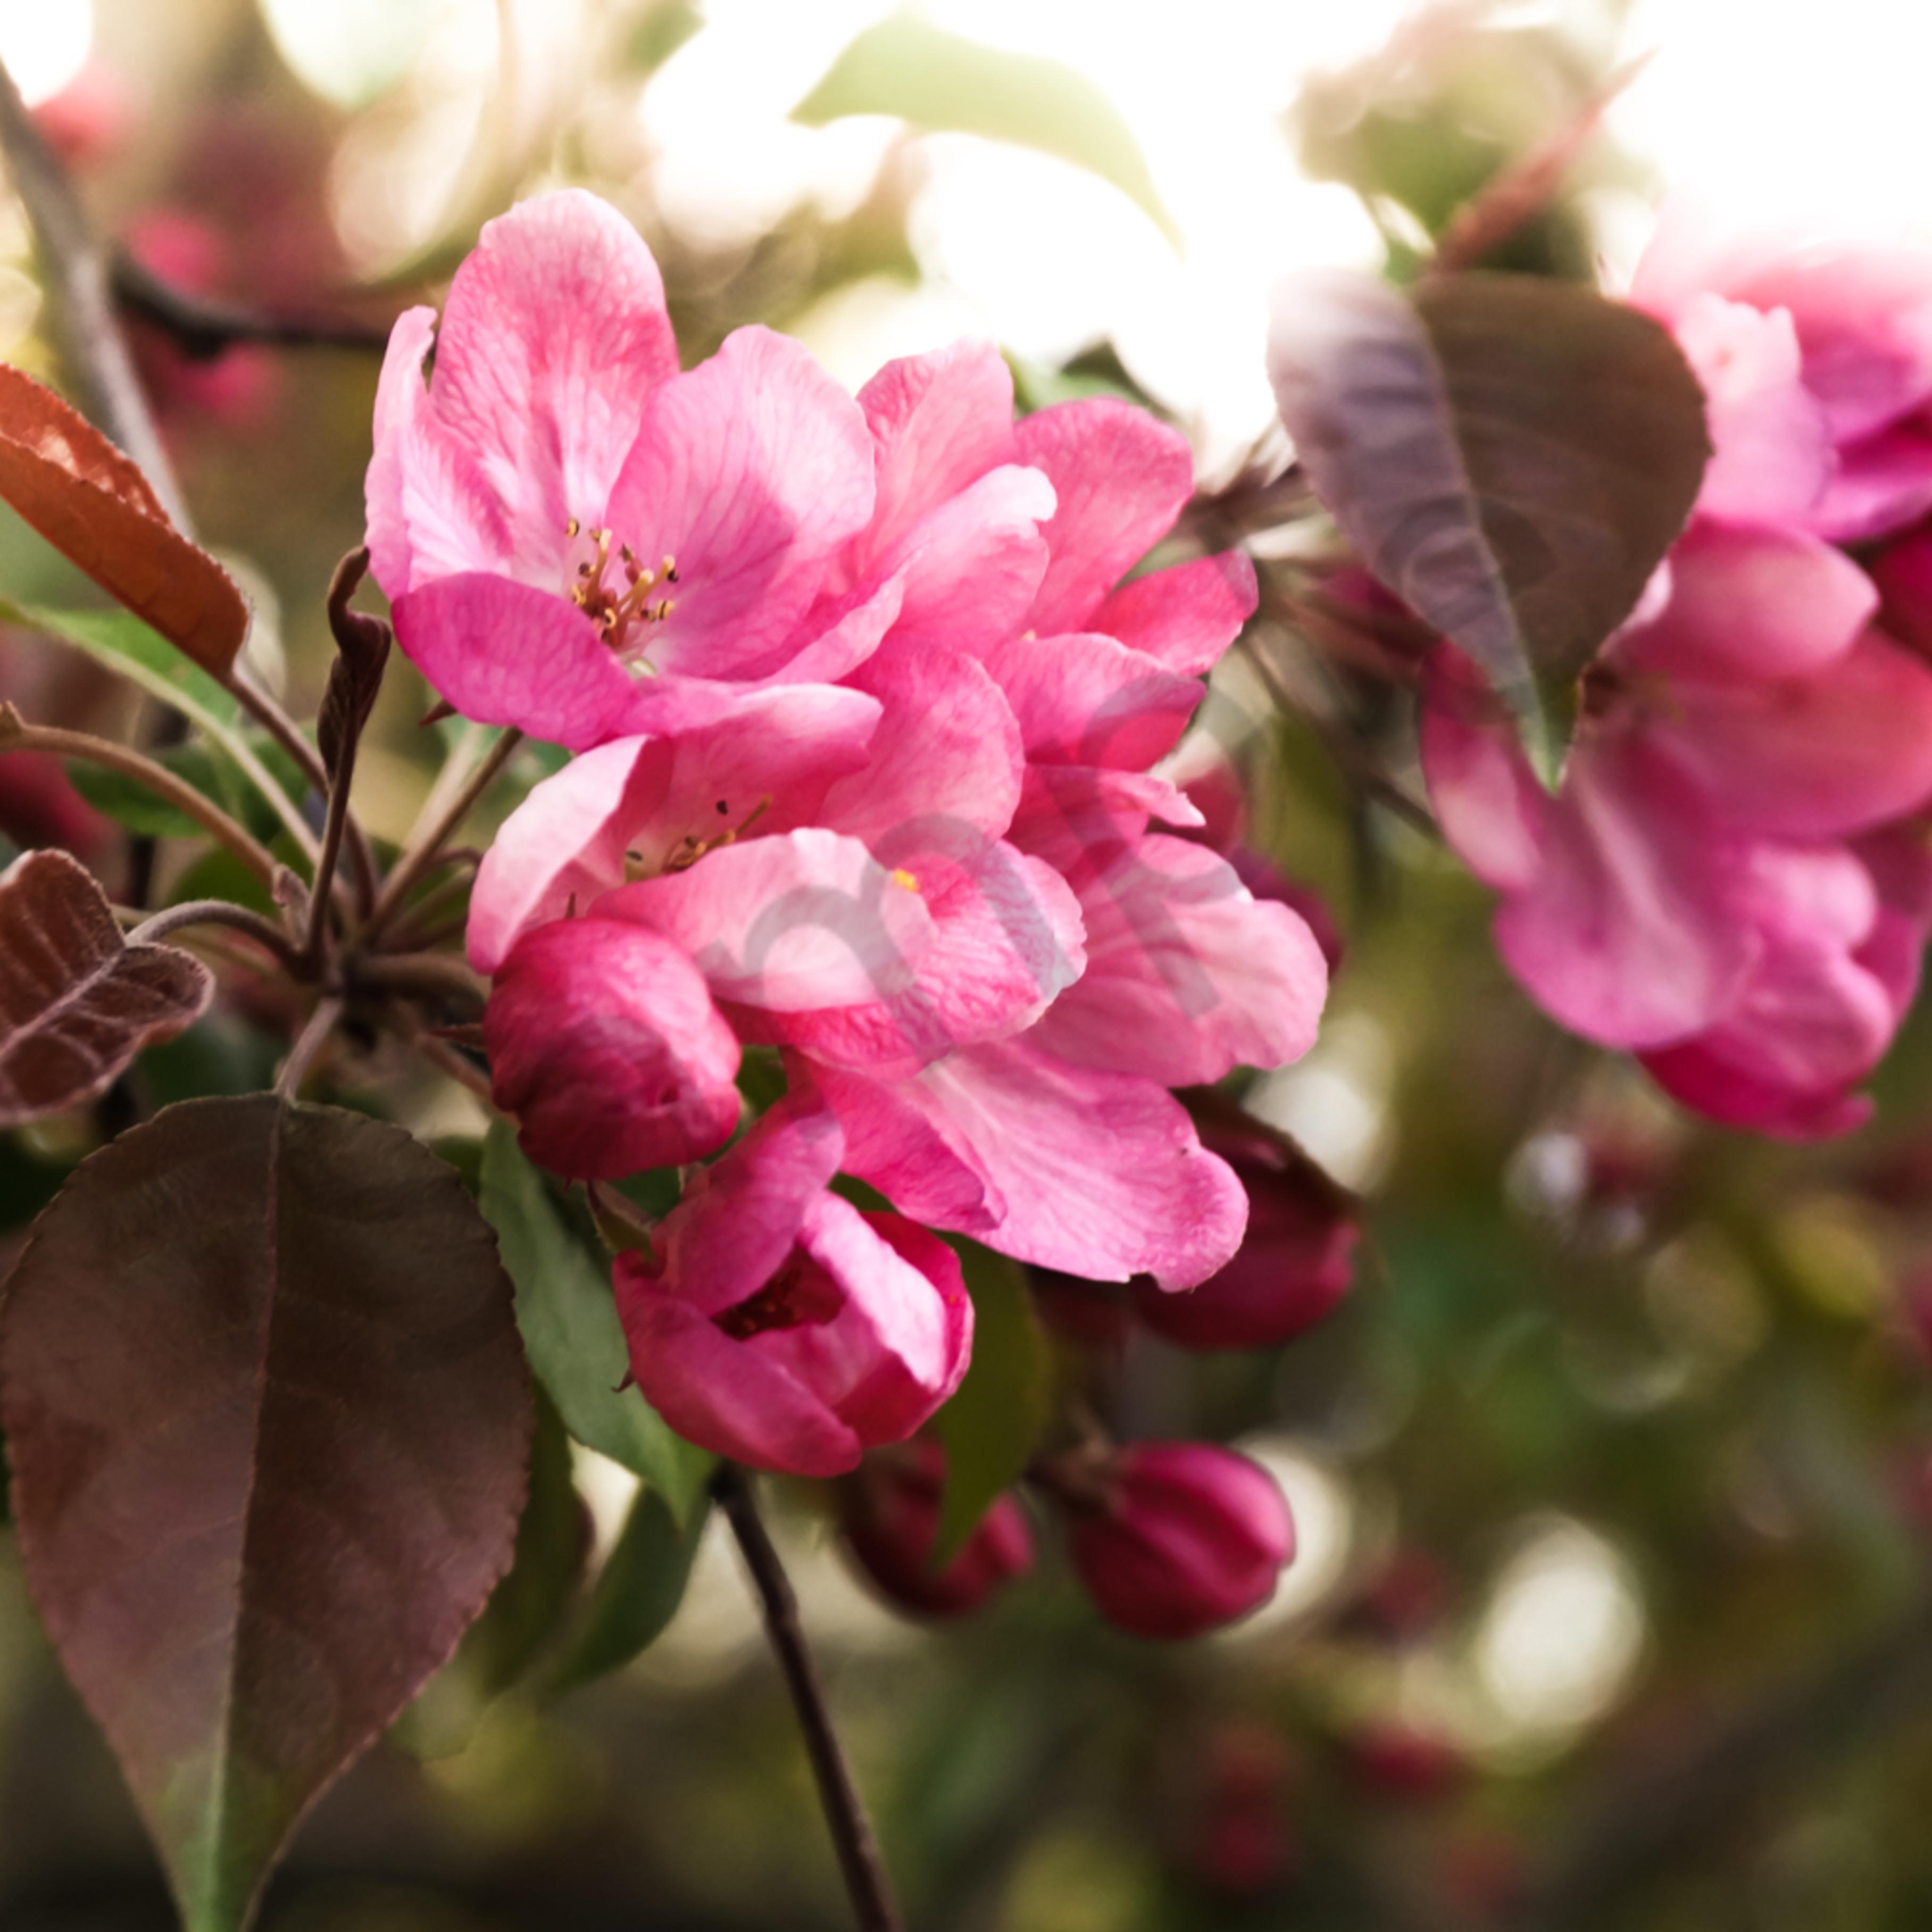 Pink cherry blossoms a8slkz